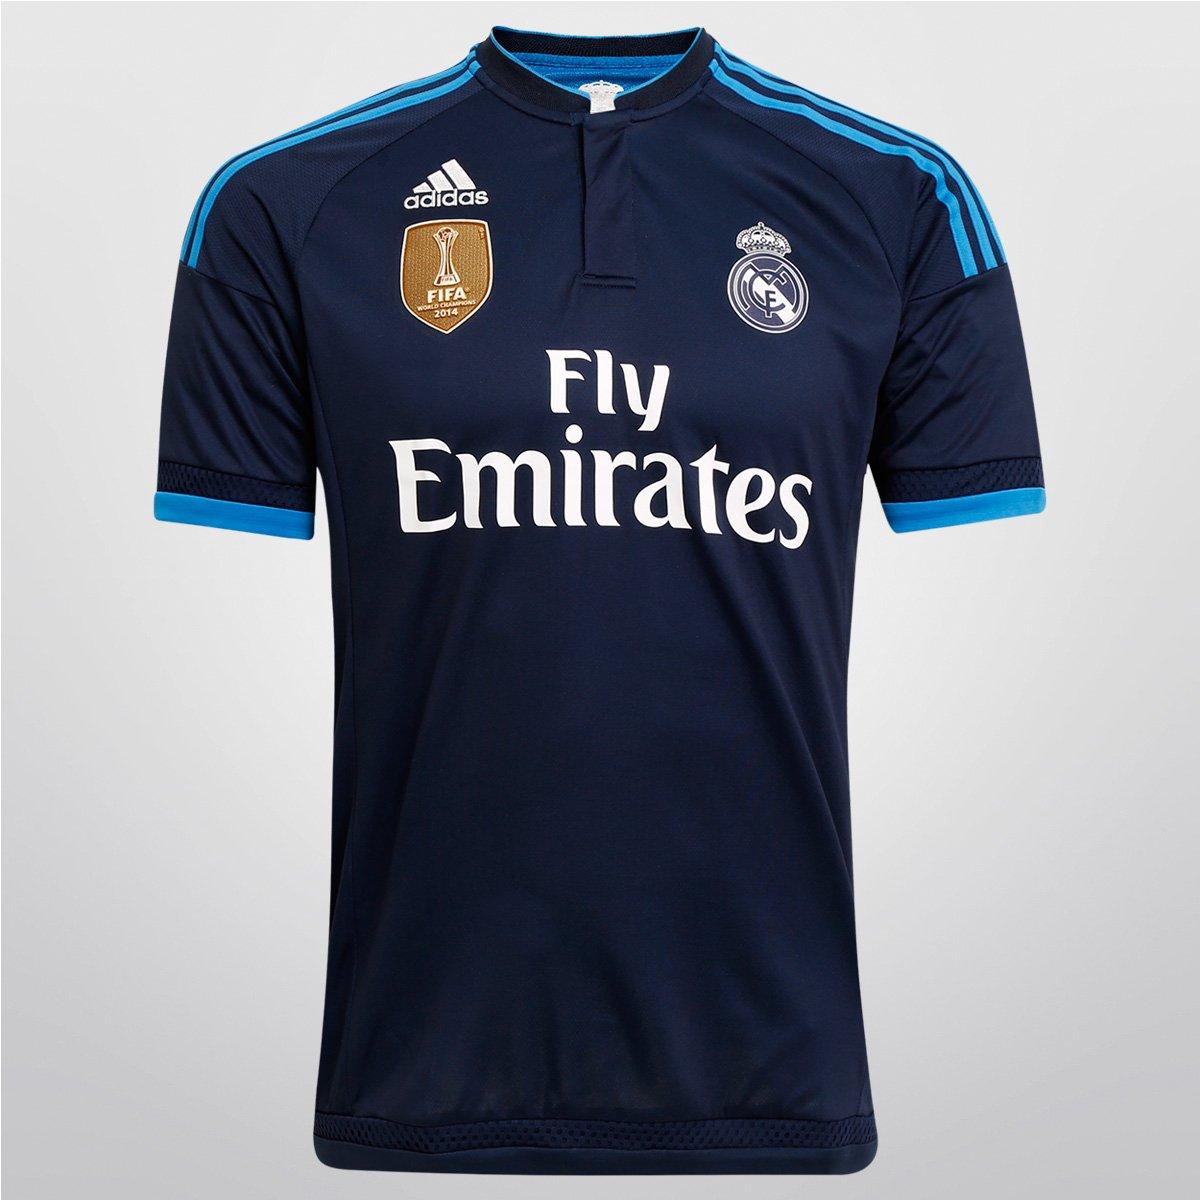 Camisa Adidas Real Madrid Third 15 16 s nº - Compre Agora  708a555376b27